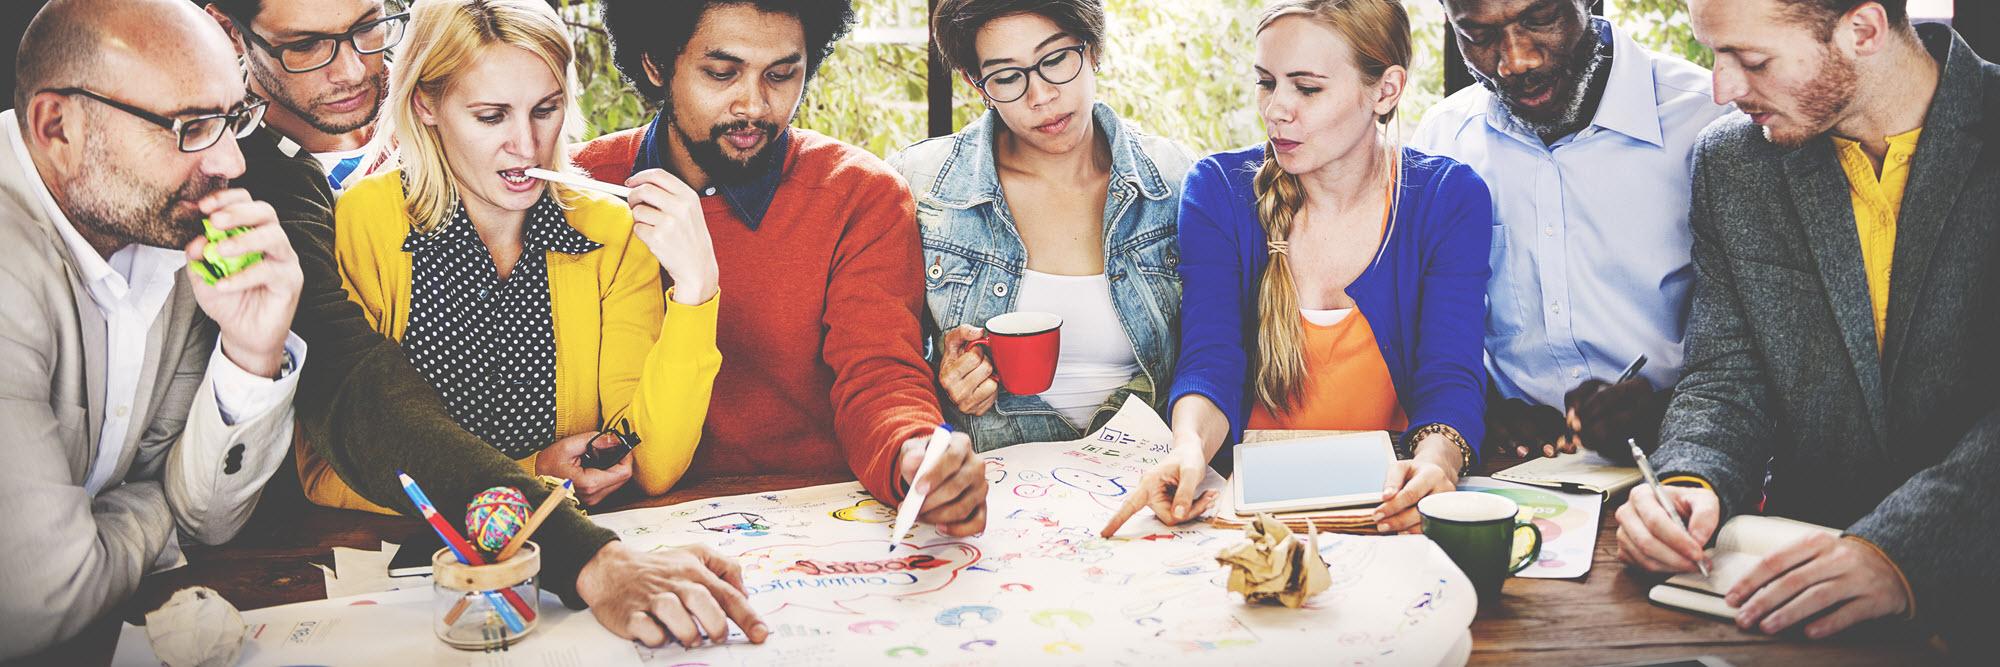 Microsoft Teams a Killer App for Collaboration